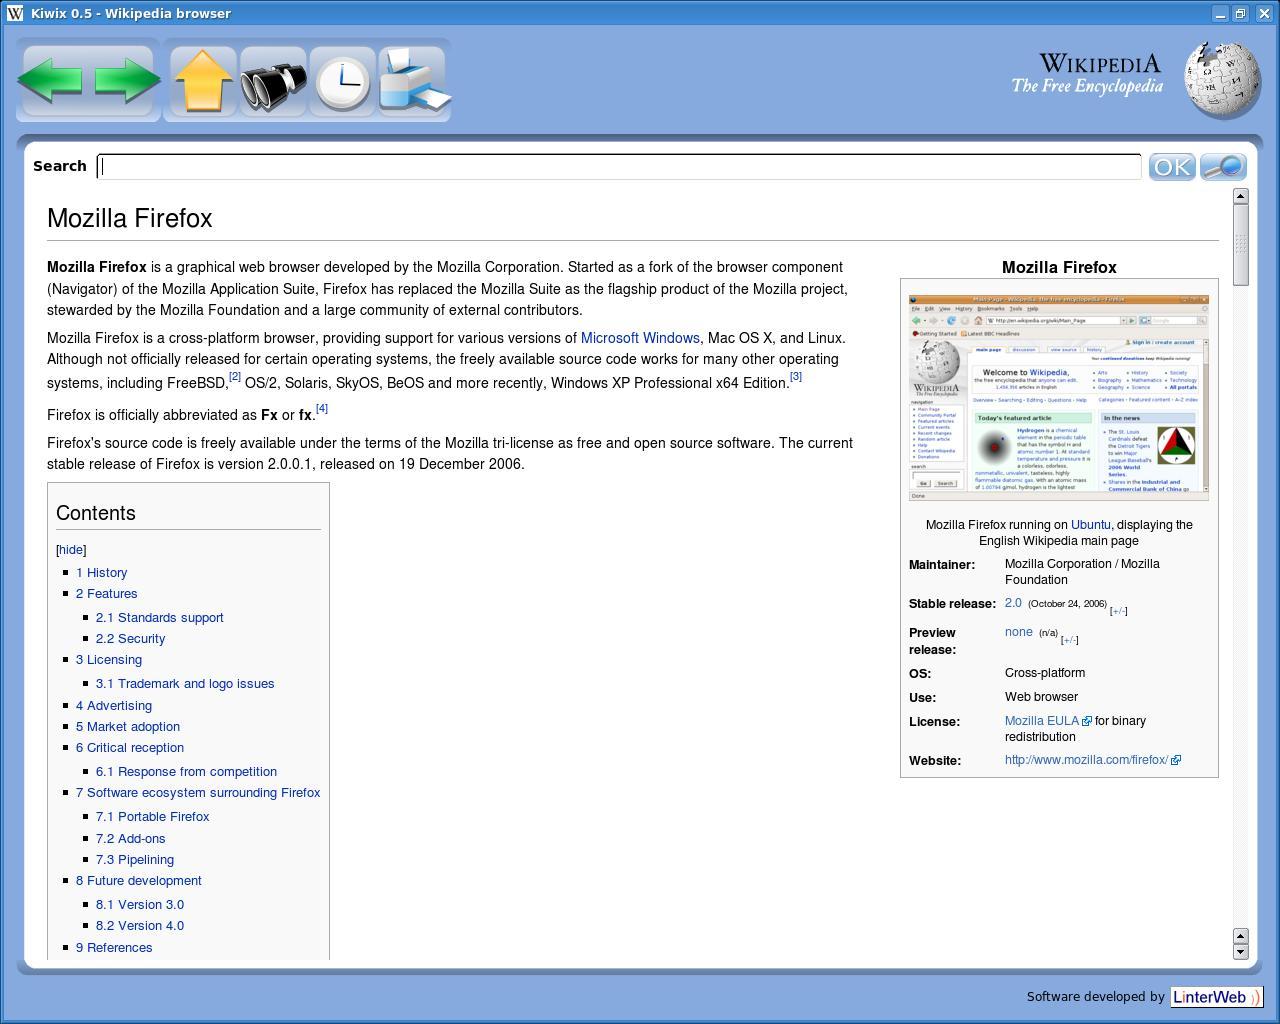 kiwix wikipedia